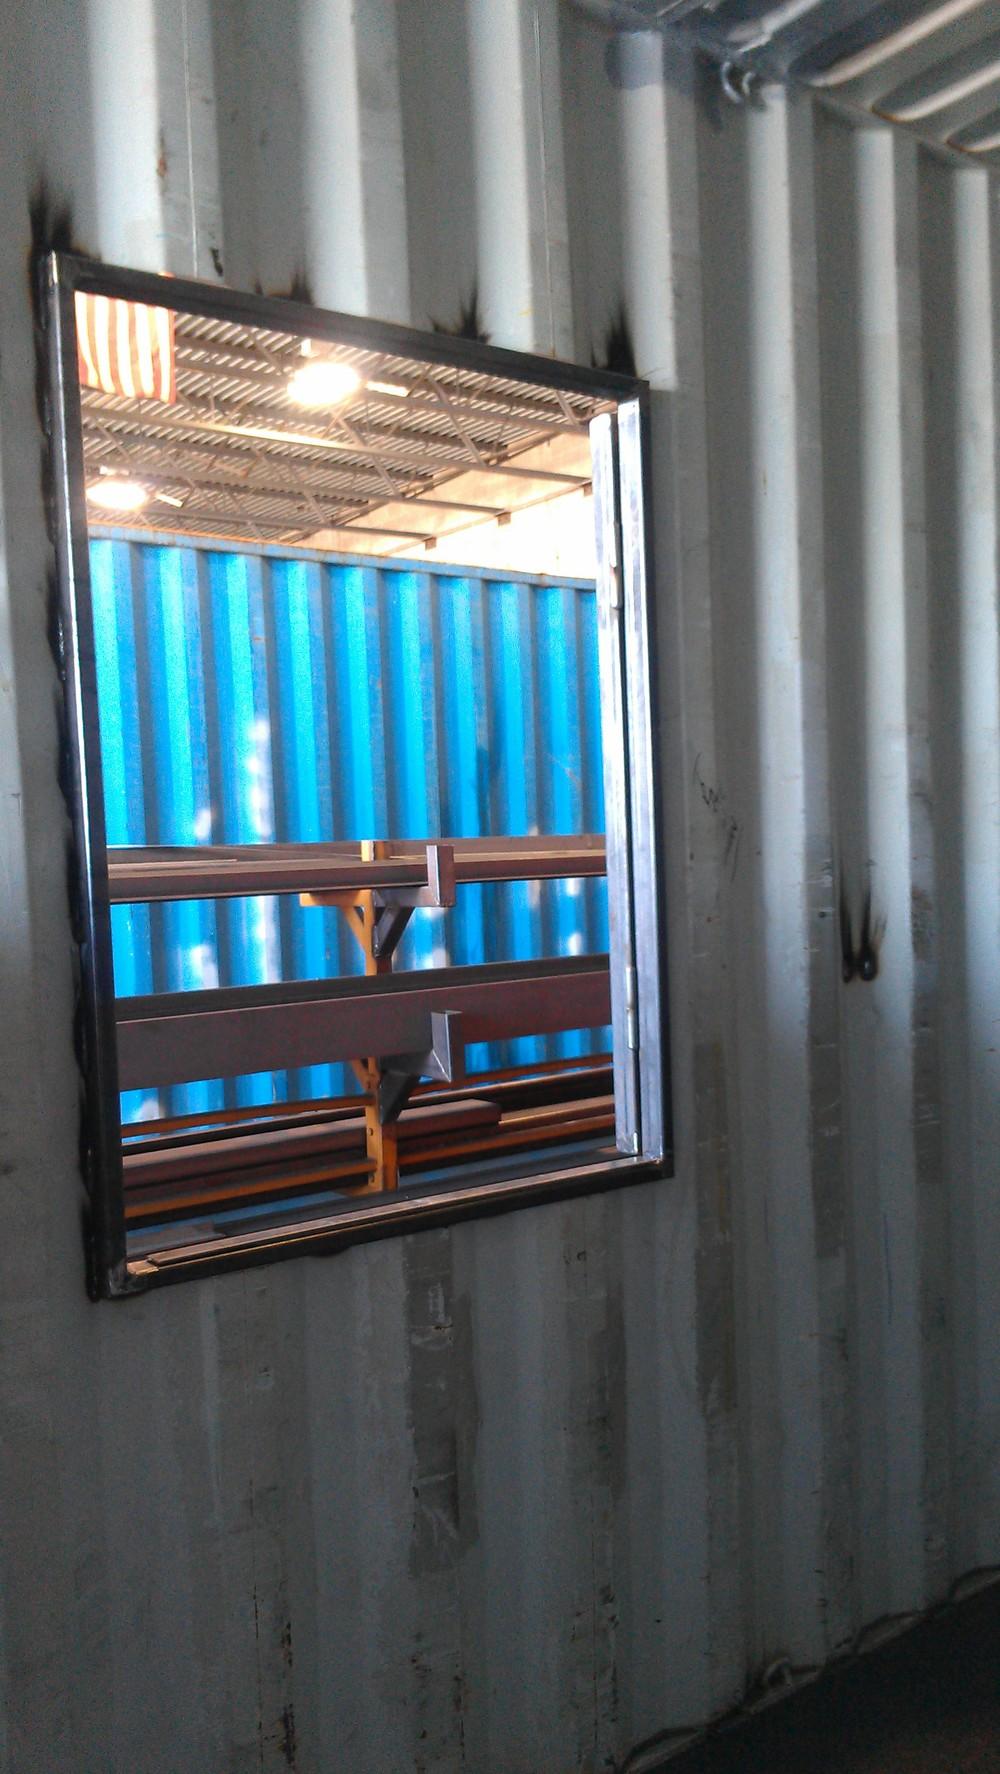 Fire Training window opening